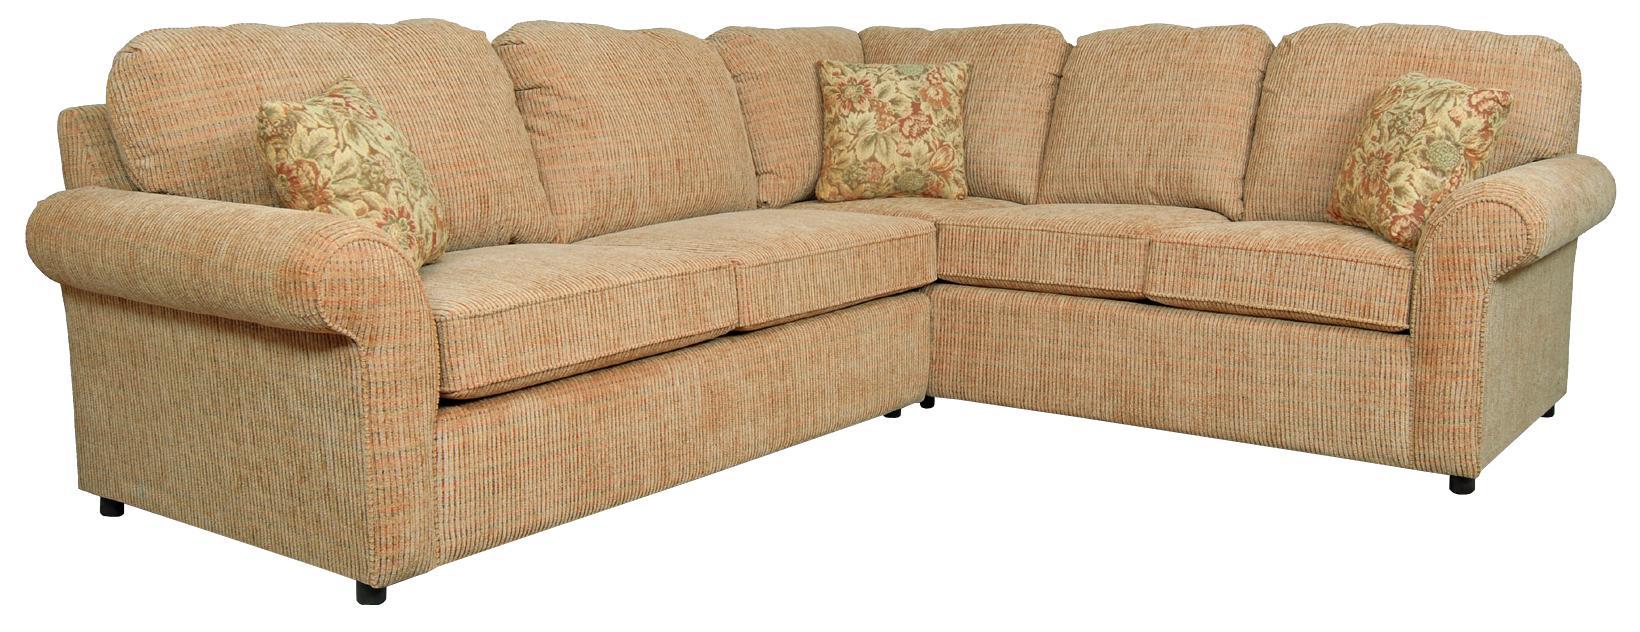 England Malibu 4-5 Seat Corner Sectional Sofa - Item Number: 2400-24+63